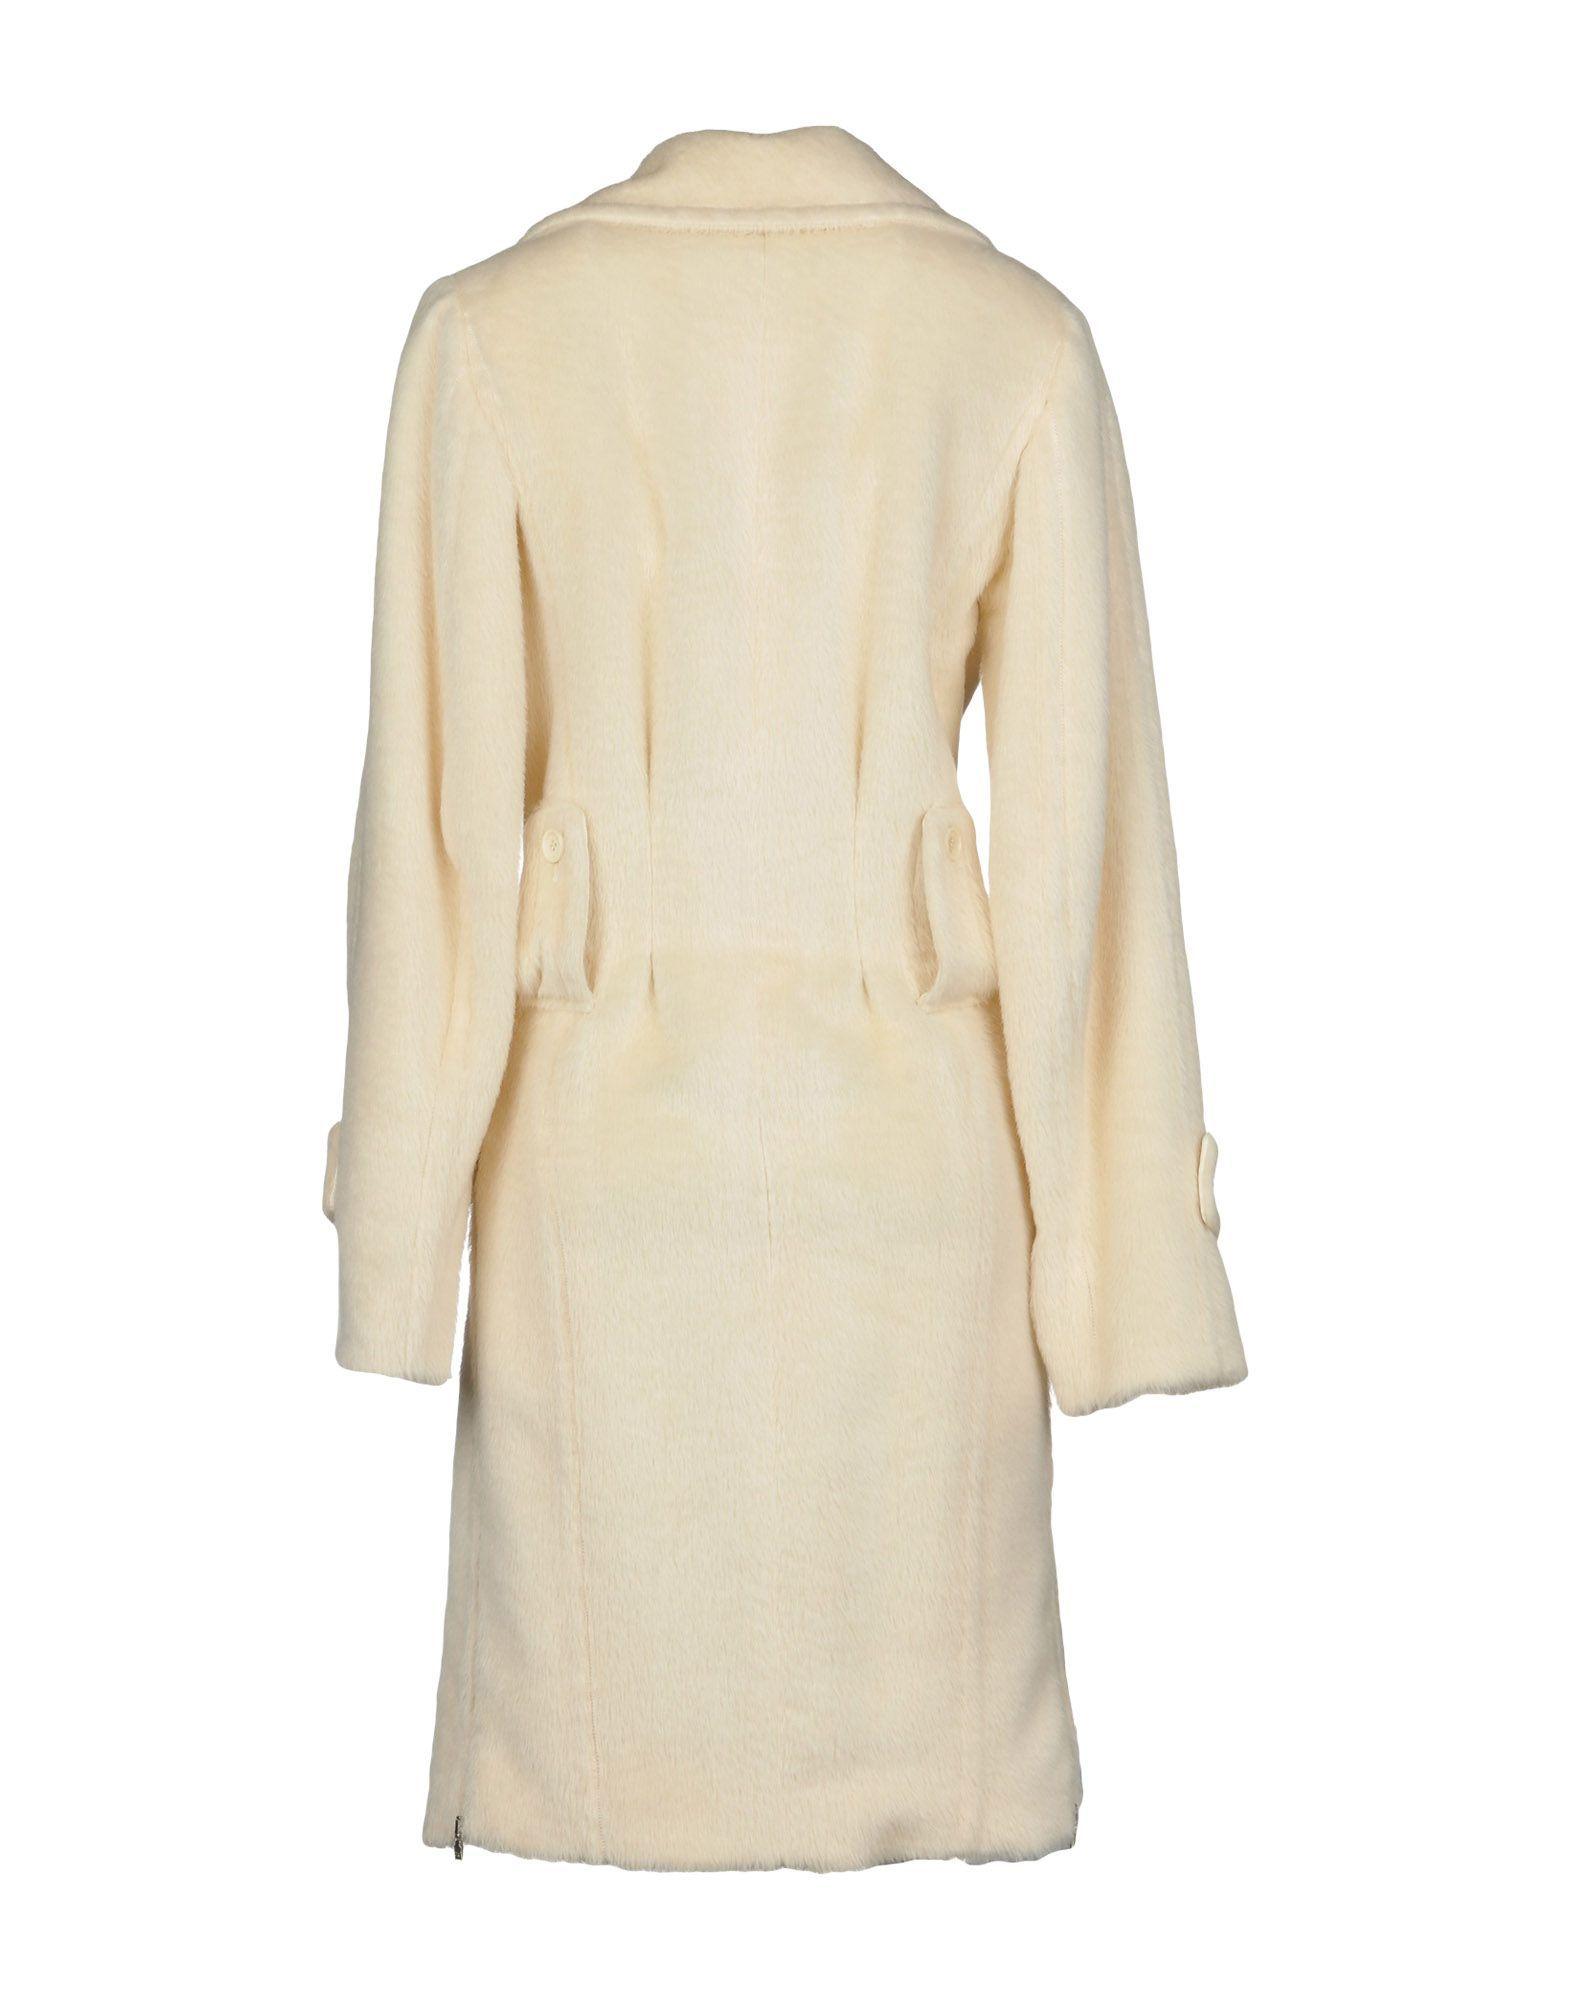 John Richmond Ivory Alpaca Overcoat